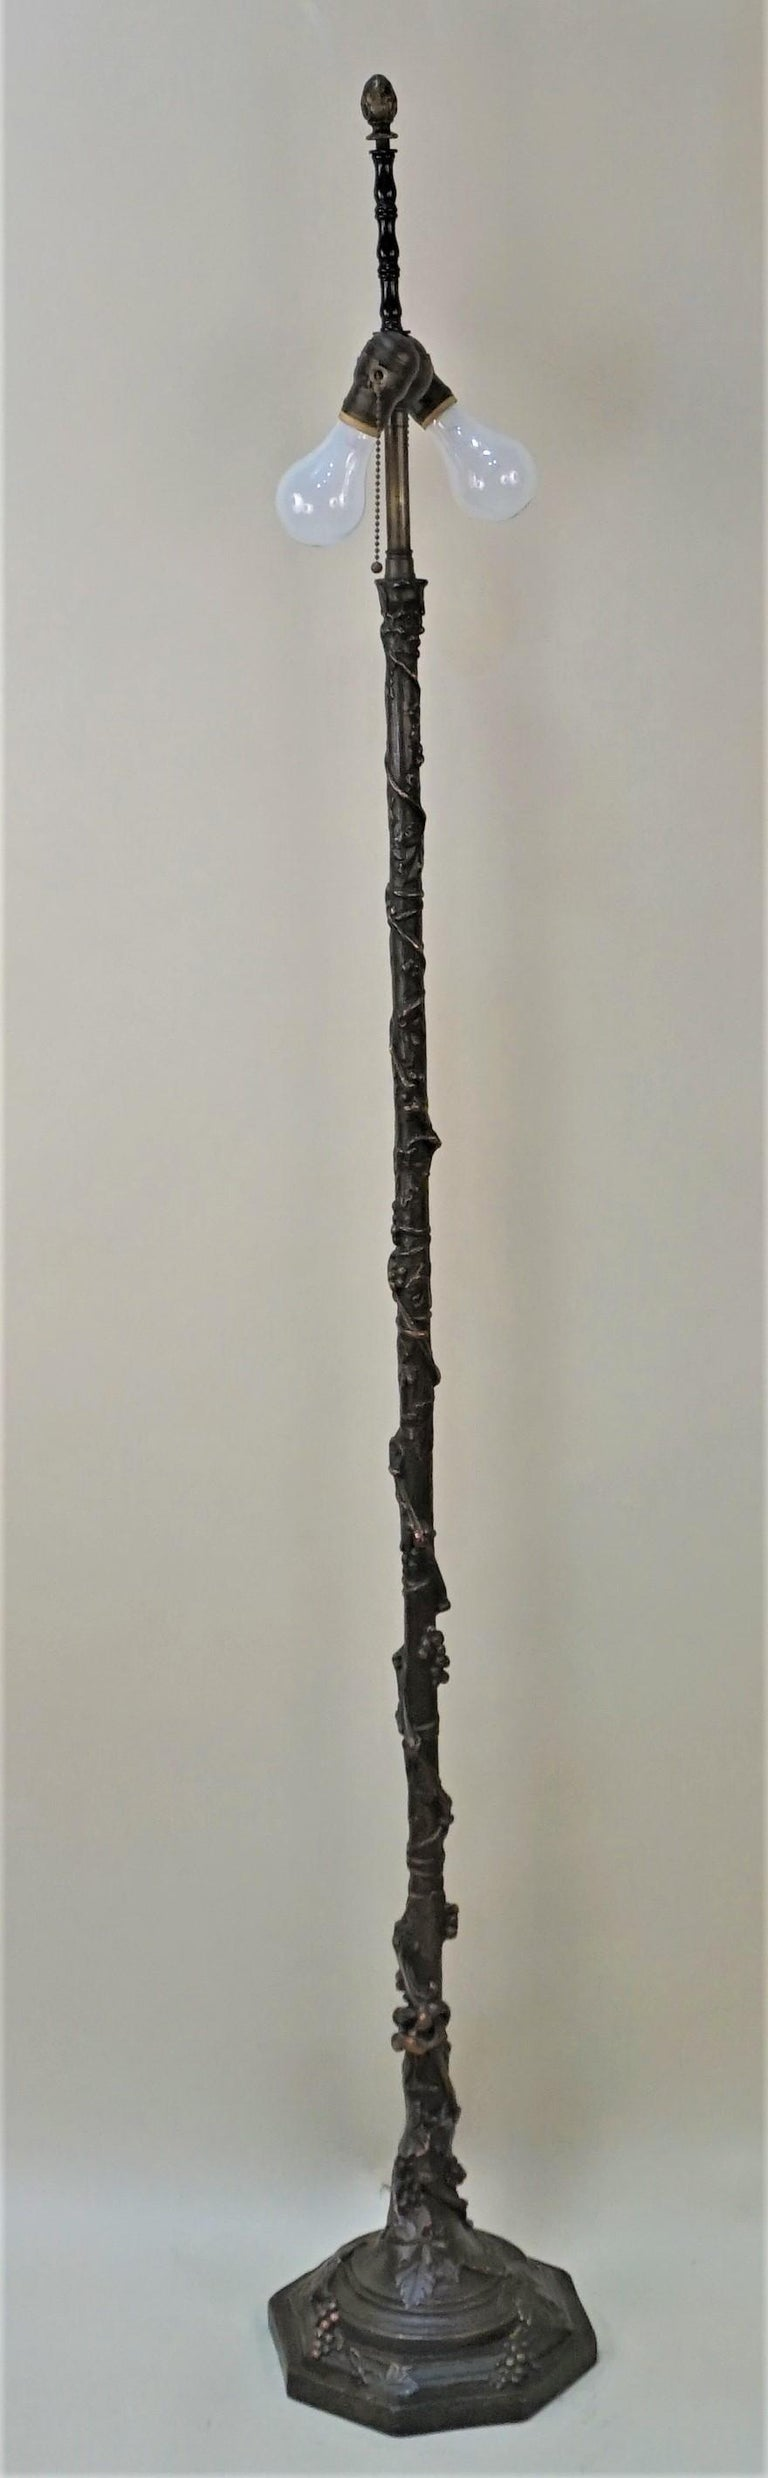 American Arts & Crafts Copper Floor Lamp In Good Condition For Sale In Fairfax, VA